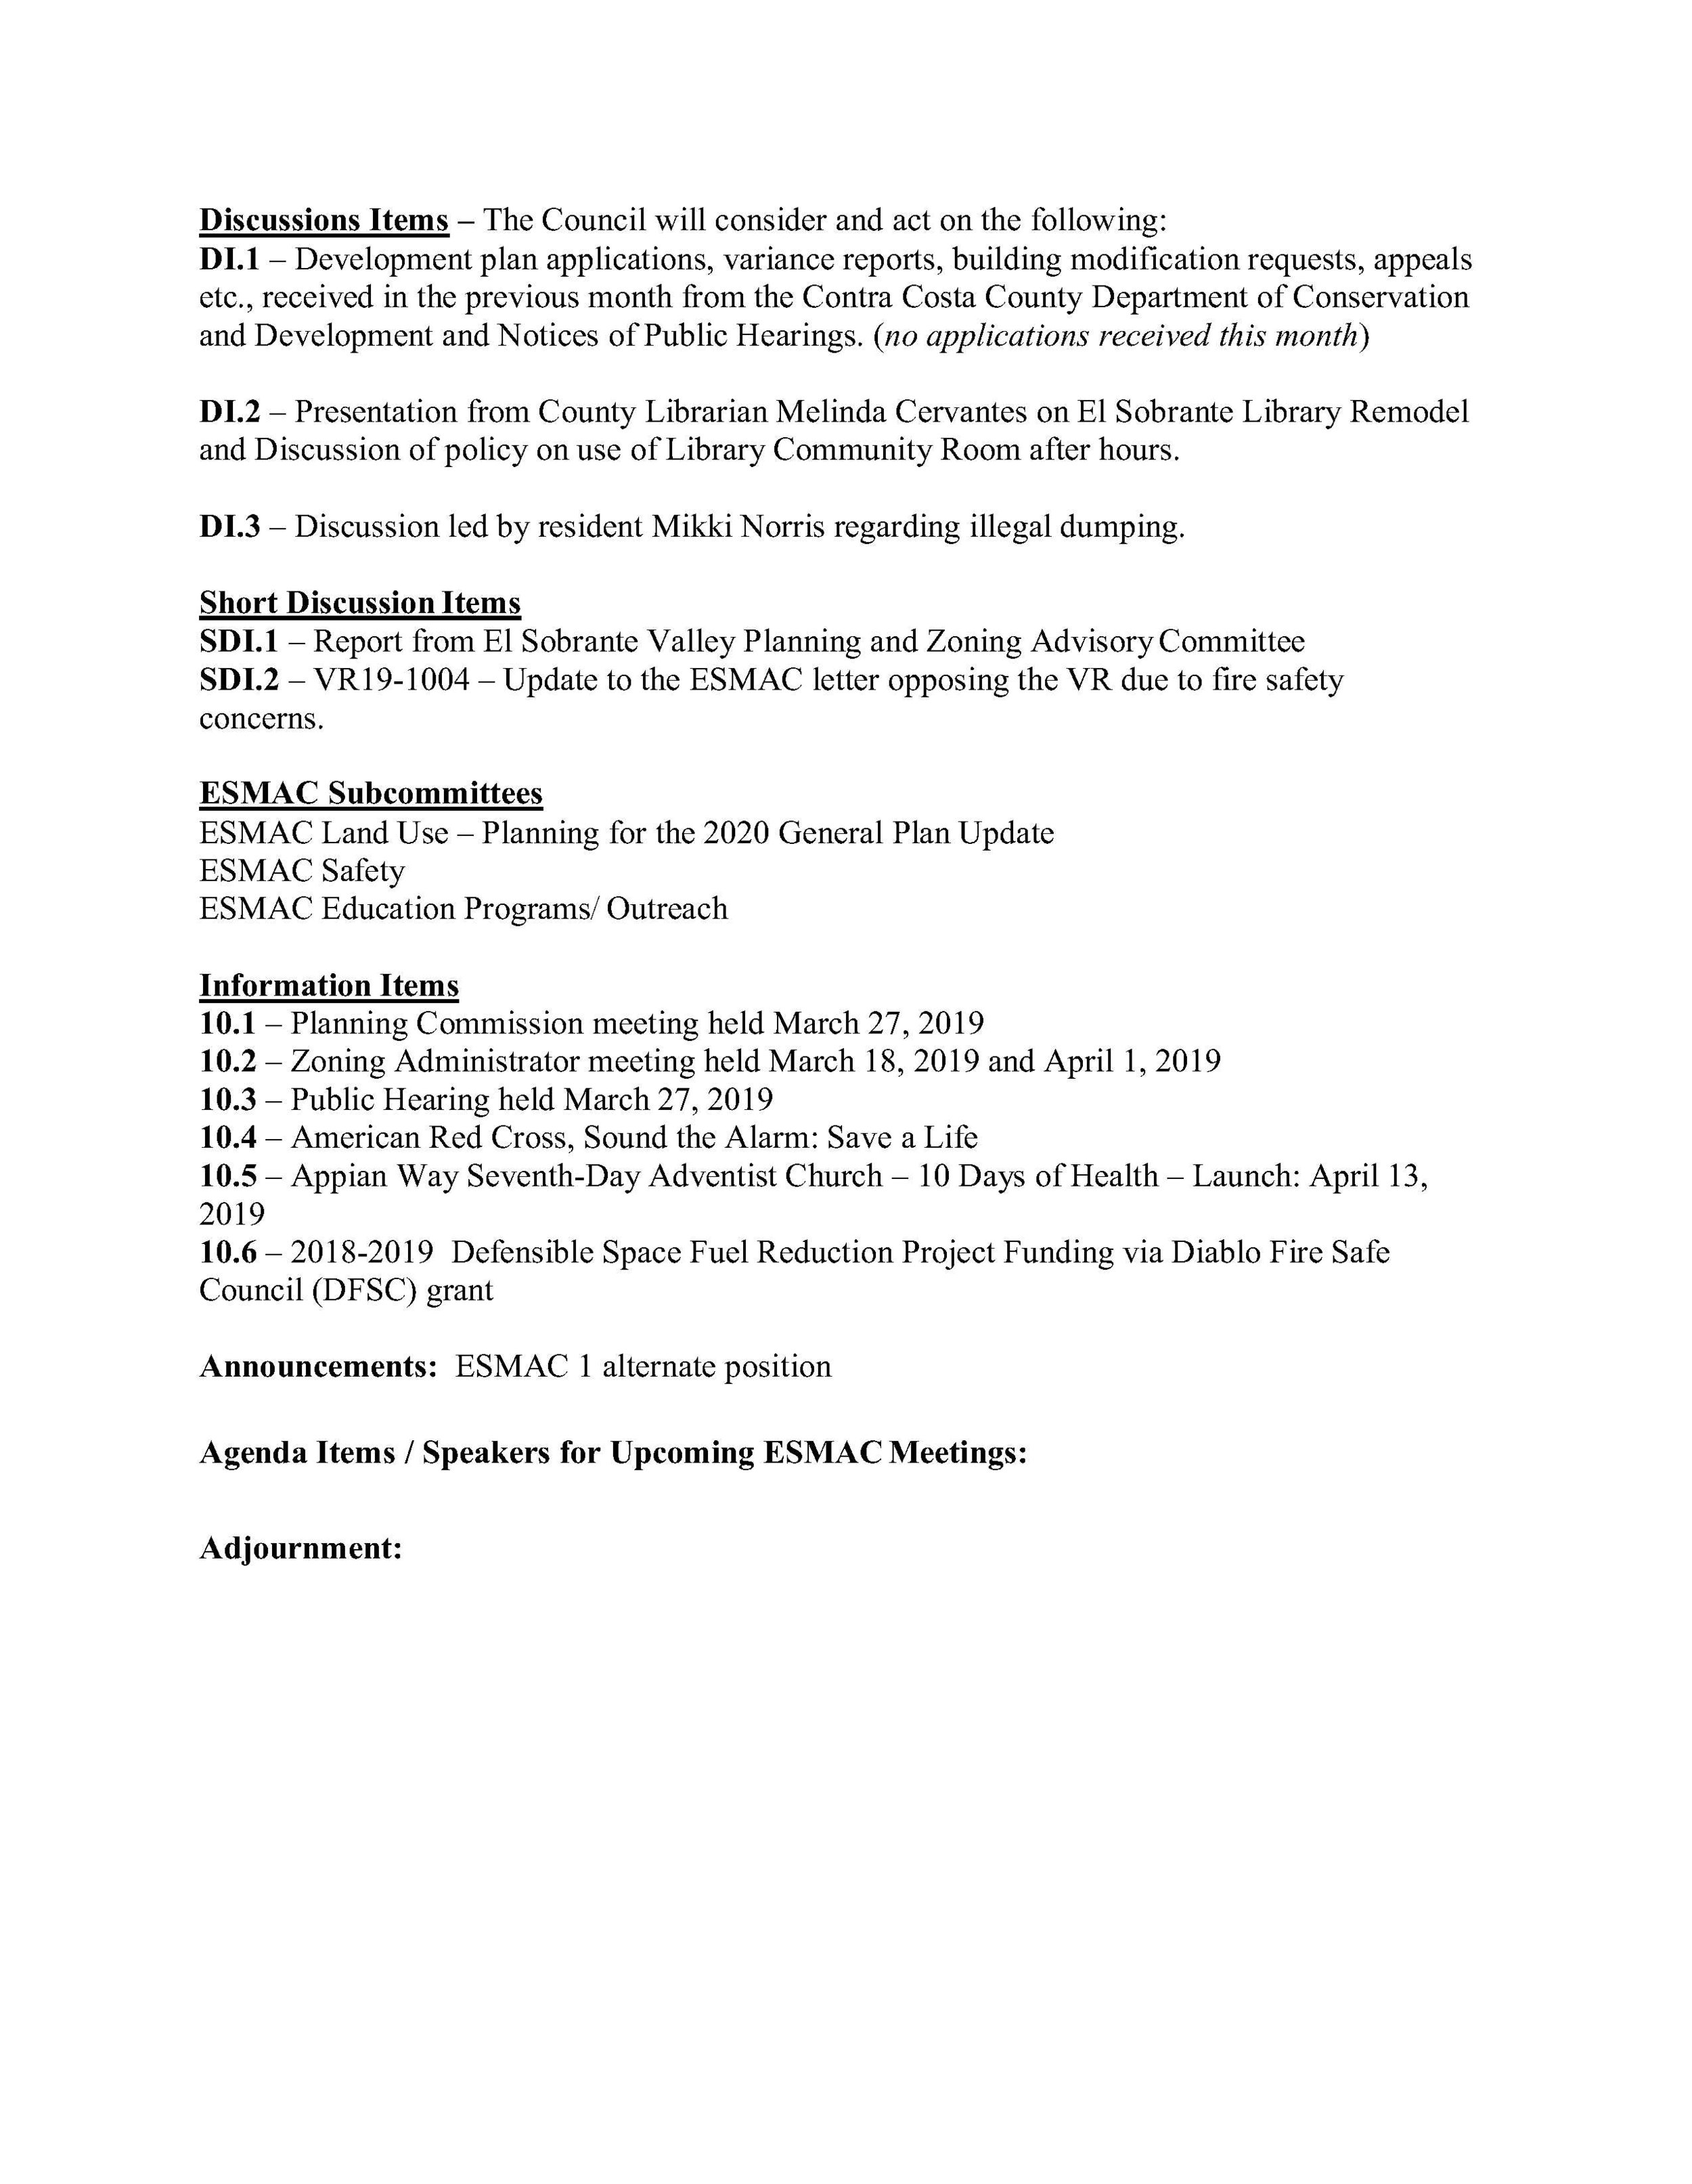 ESMAC Agenda 4.10.19_2.jpg